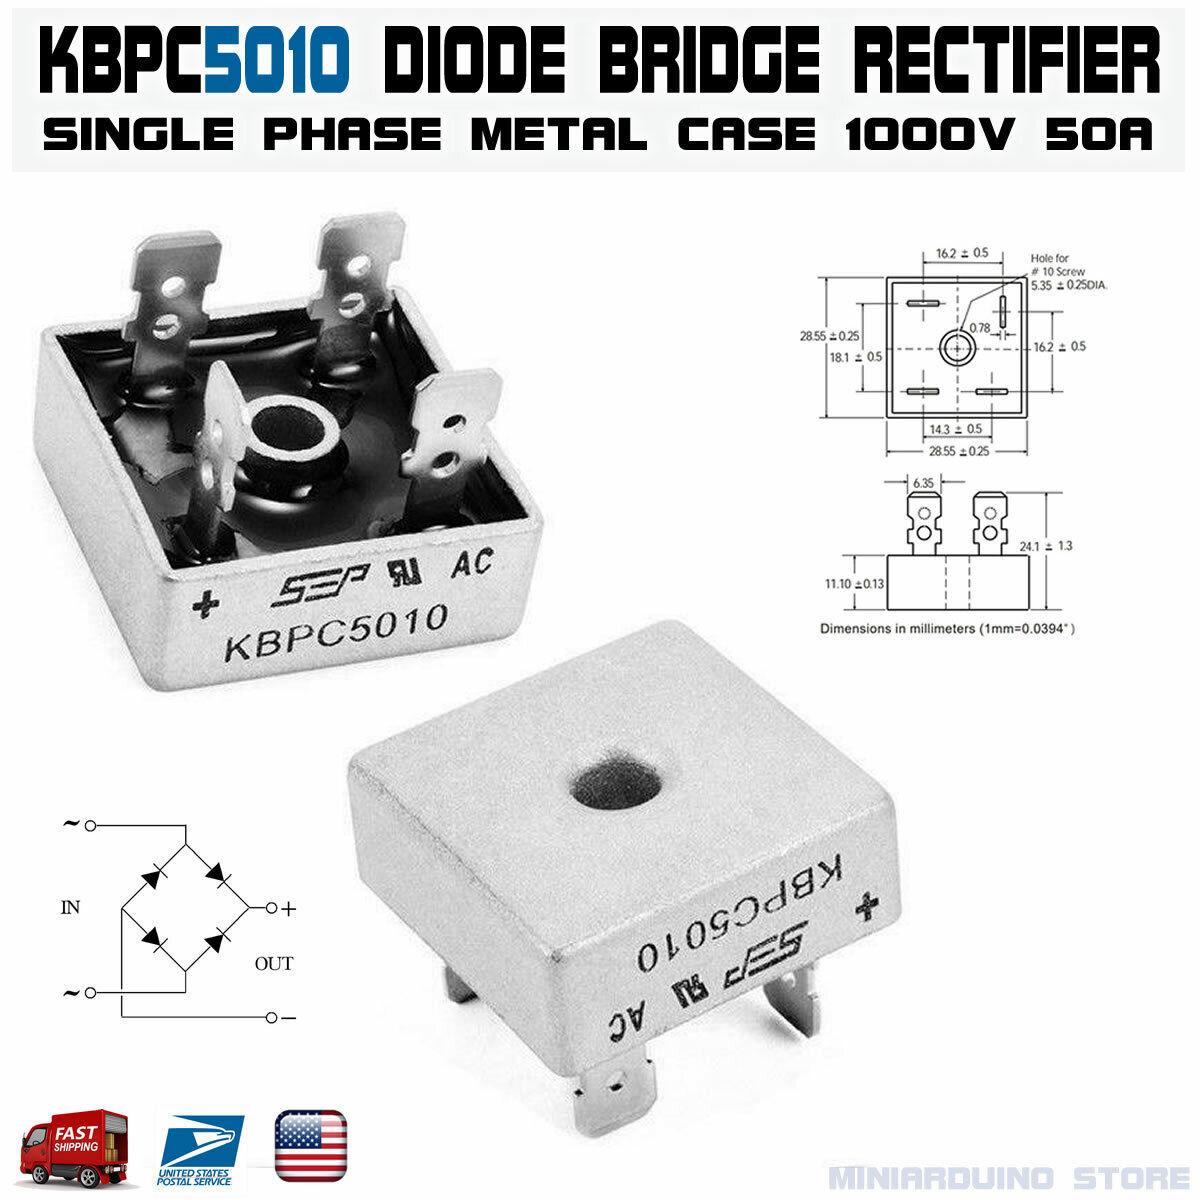 2pz Bridge diodes 50a 1000v KBPC 5010 Rectifier Single Phase with Faston